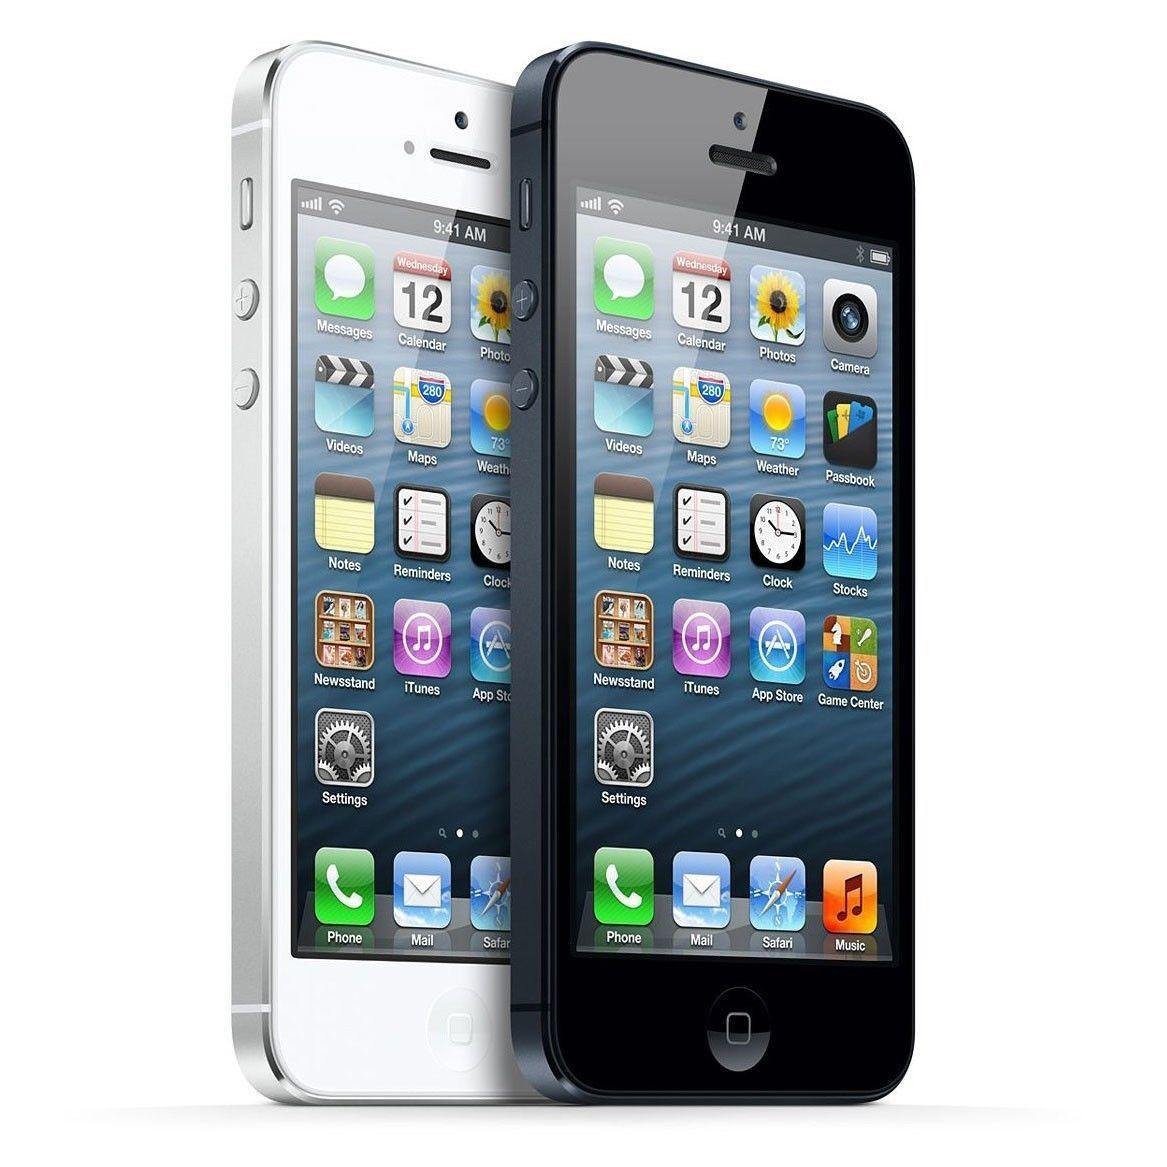 Details about Apple iPhone 5 16GB Verizon Wireless 4G LTE